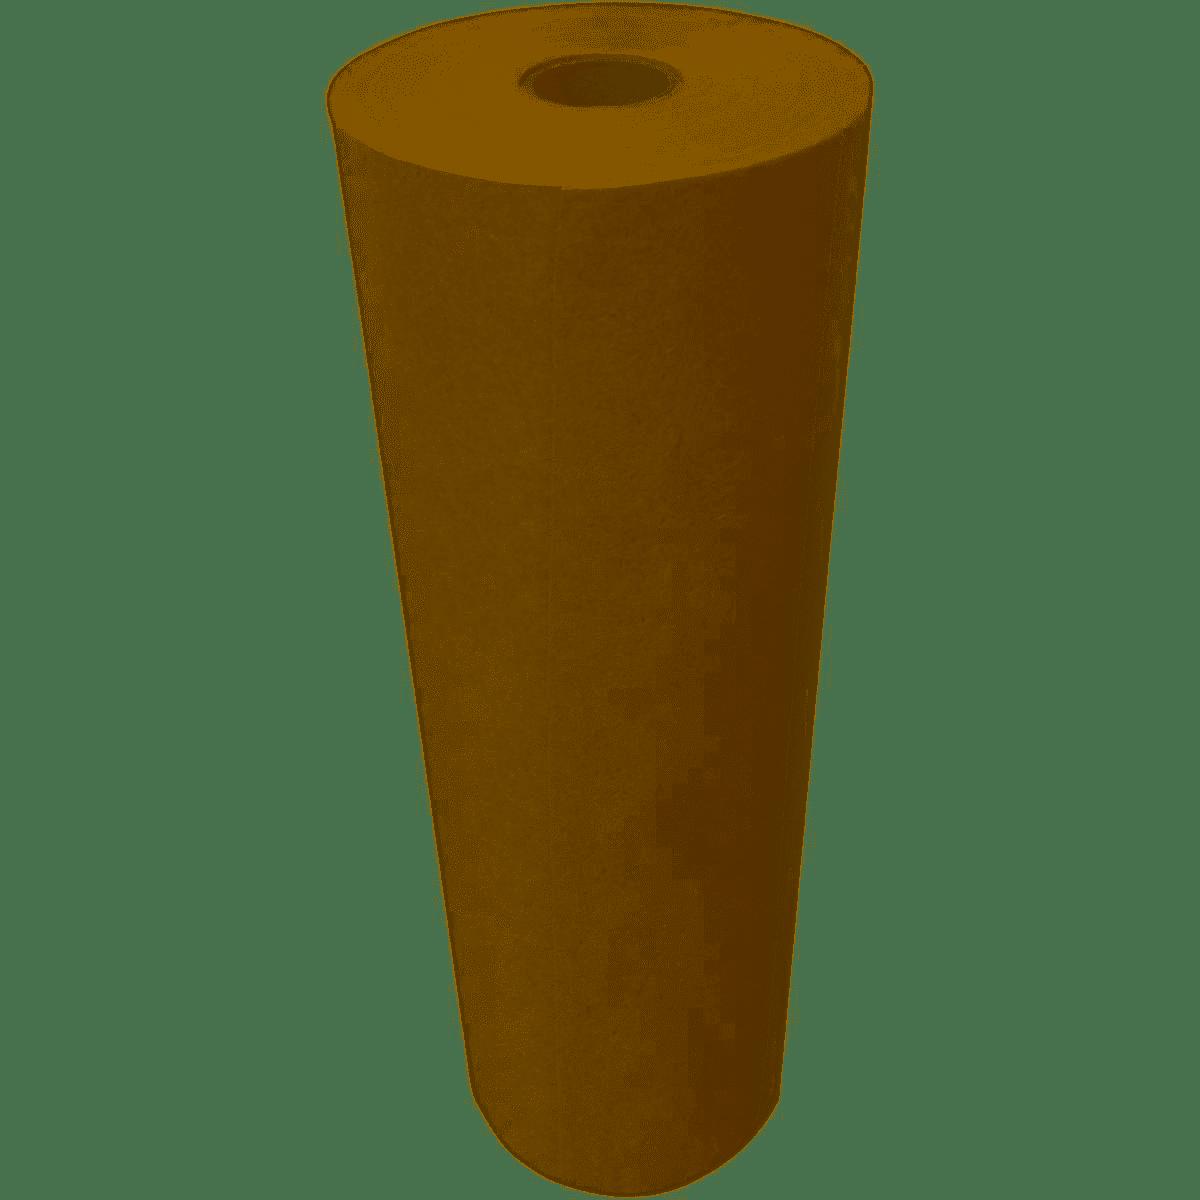 Bobina manilha Kraft 120cm x 100cm 80 grs Metro